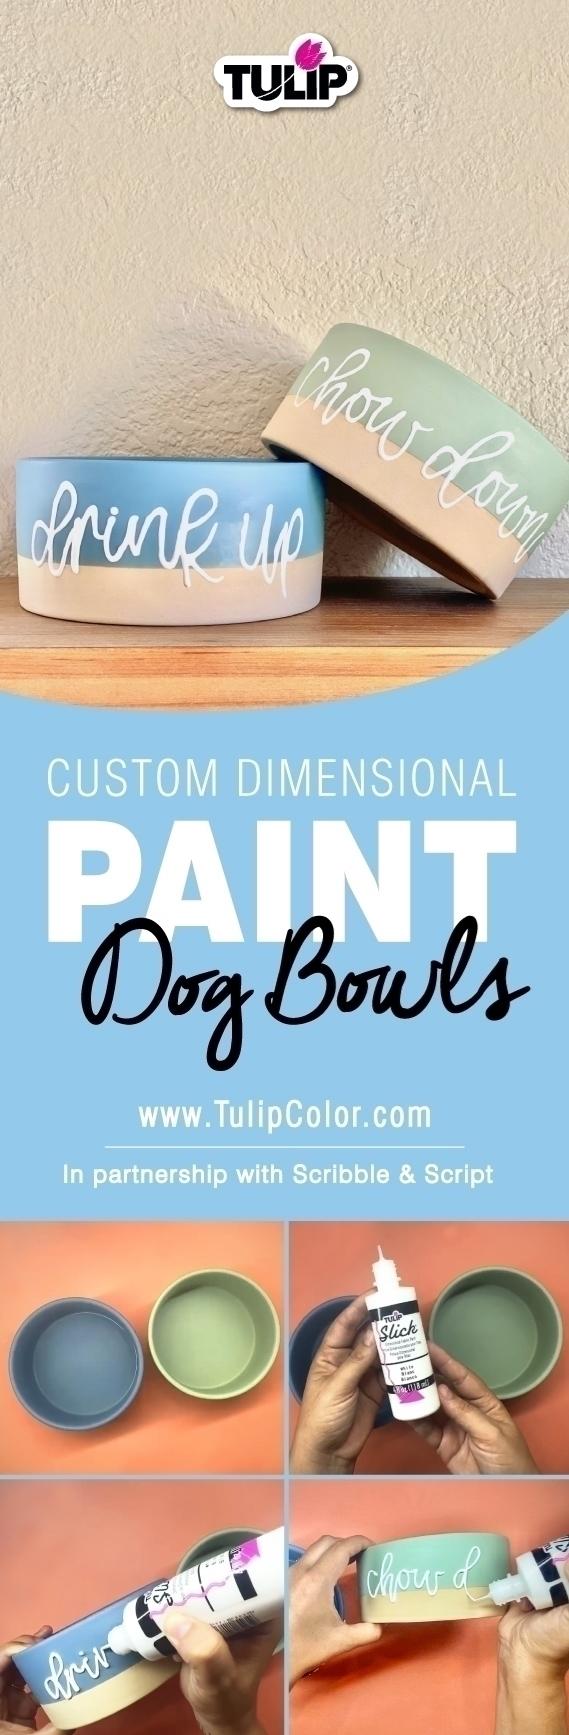 Custom Dog Bowl Painting Tutorial